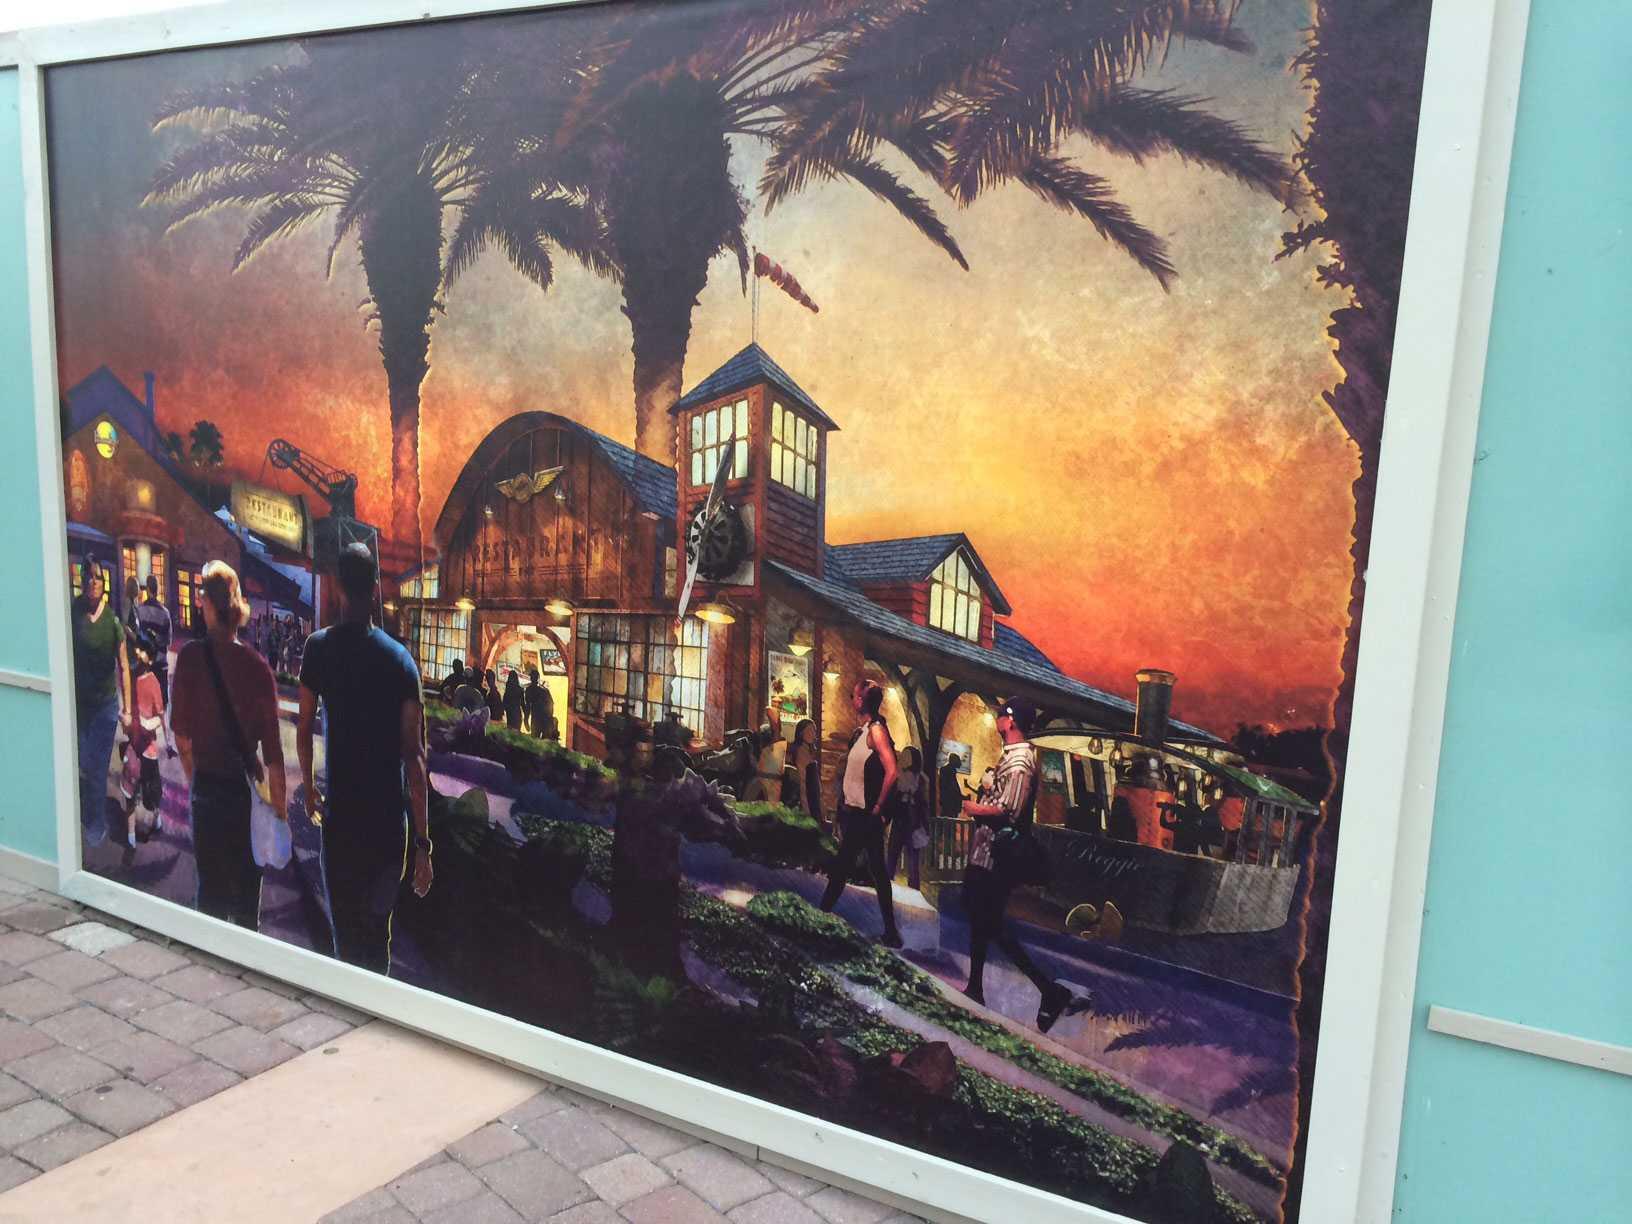 The Hangar restaurant concept art at Disney Springs